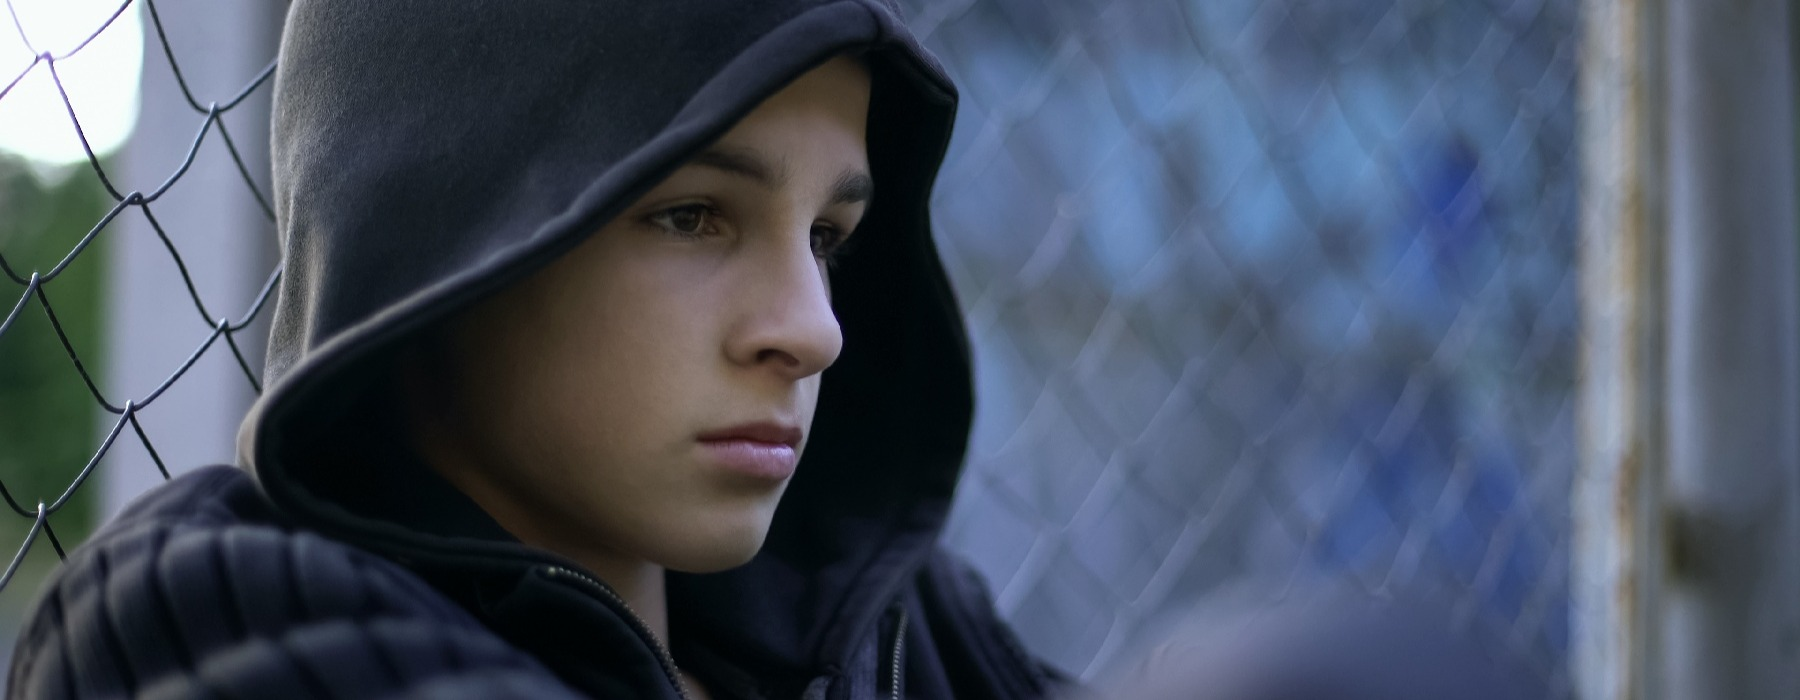 sad teen boy against the wall-4-1